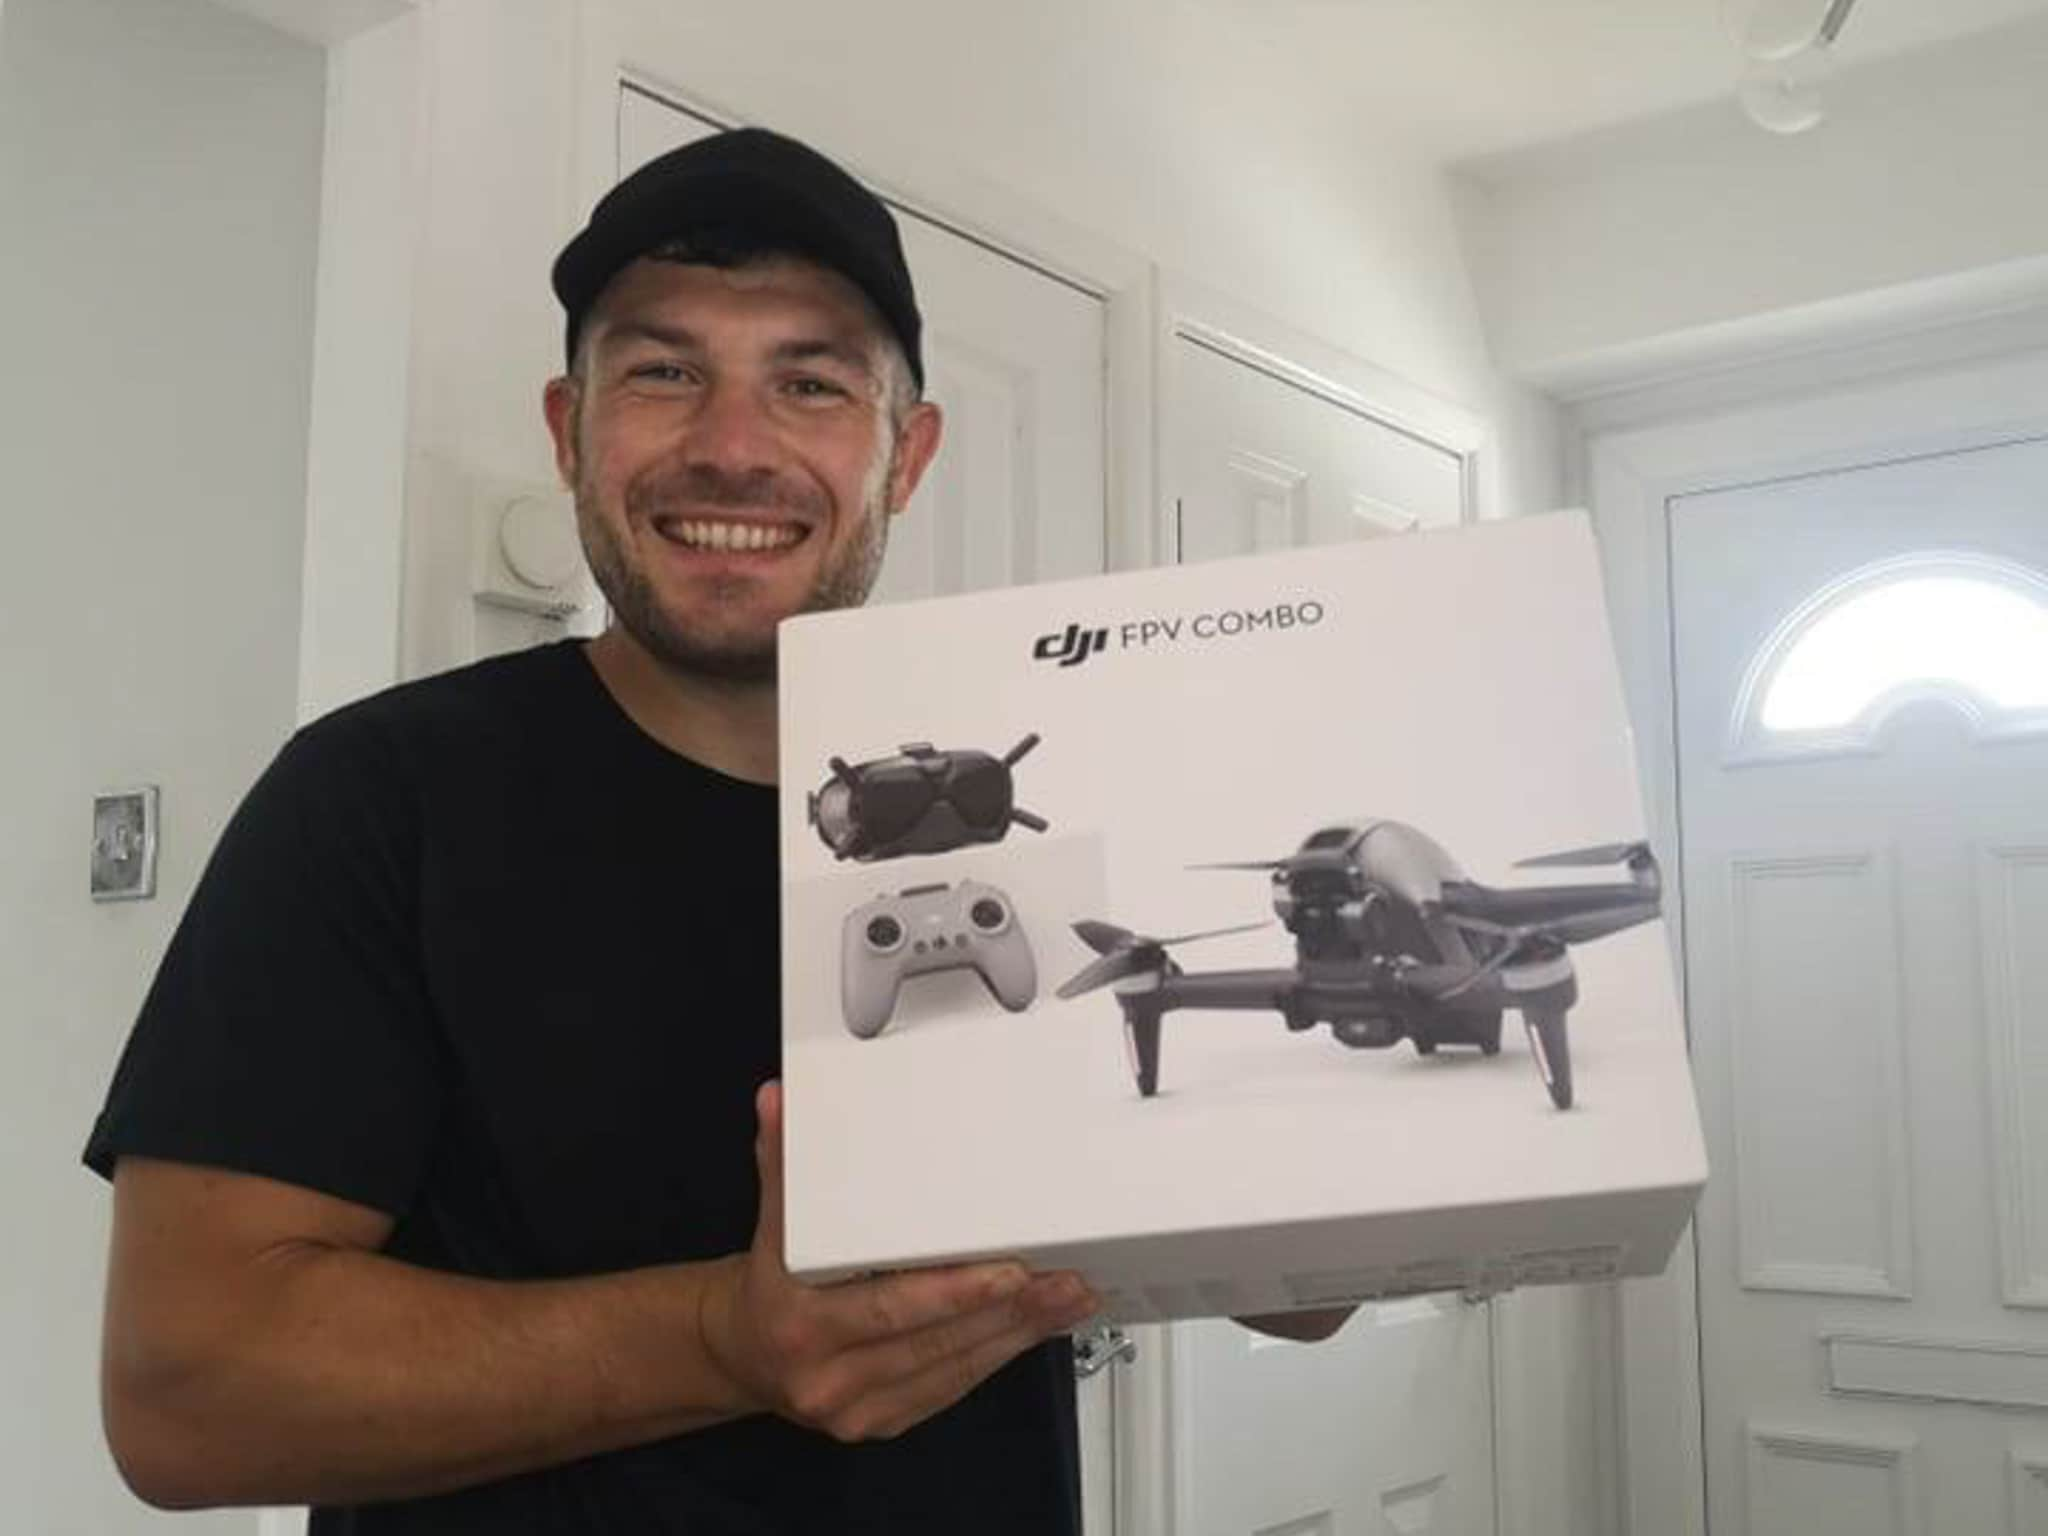 Winner Stewart Cutts of a DJI Drone FPV Combo - 19th July